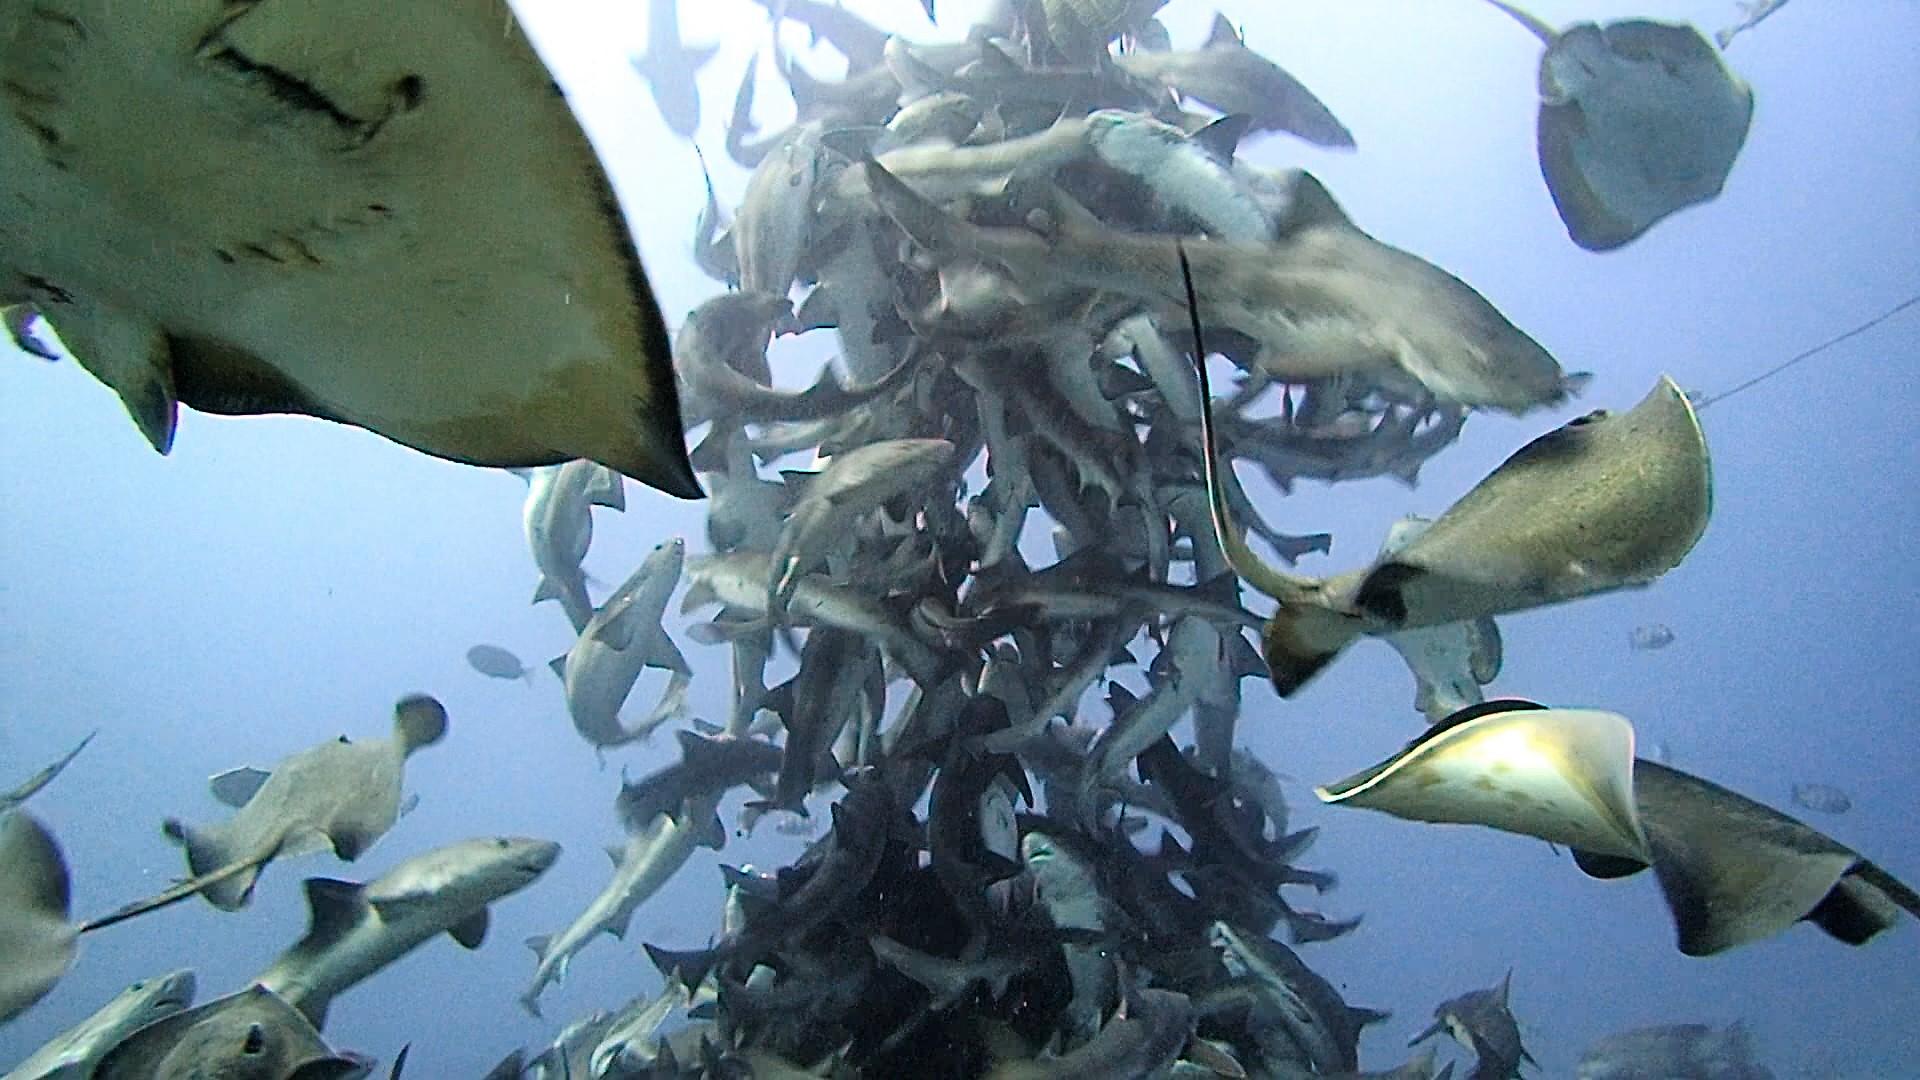 sharkdiving daytrip from Tokyo Japan Chiba Tateyama sharkscramble